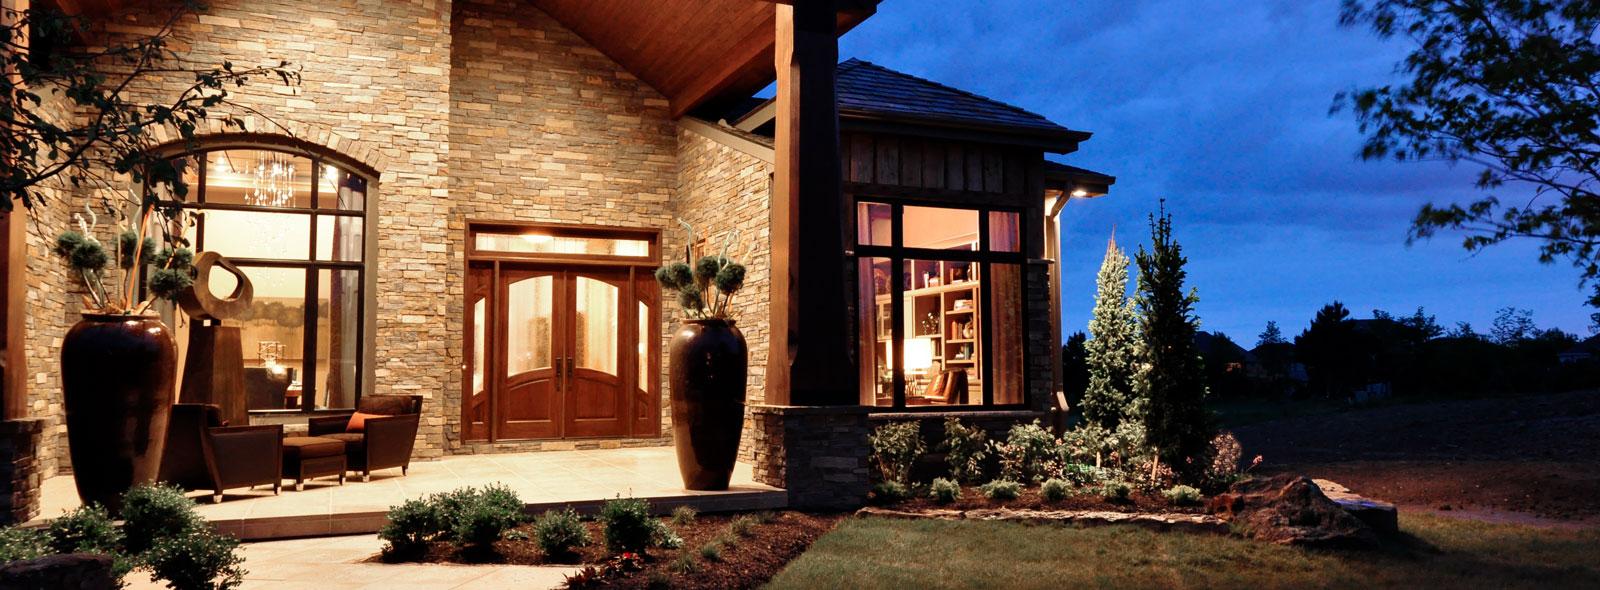 La home builders lincoln nebraska front entryway 1600x590